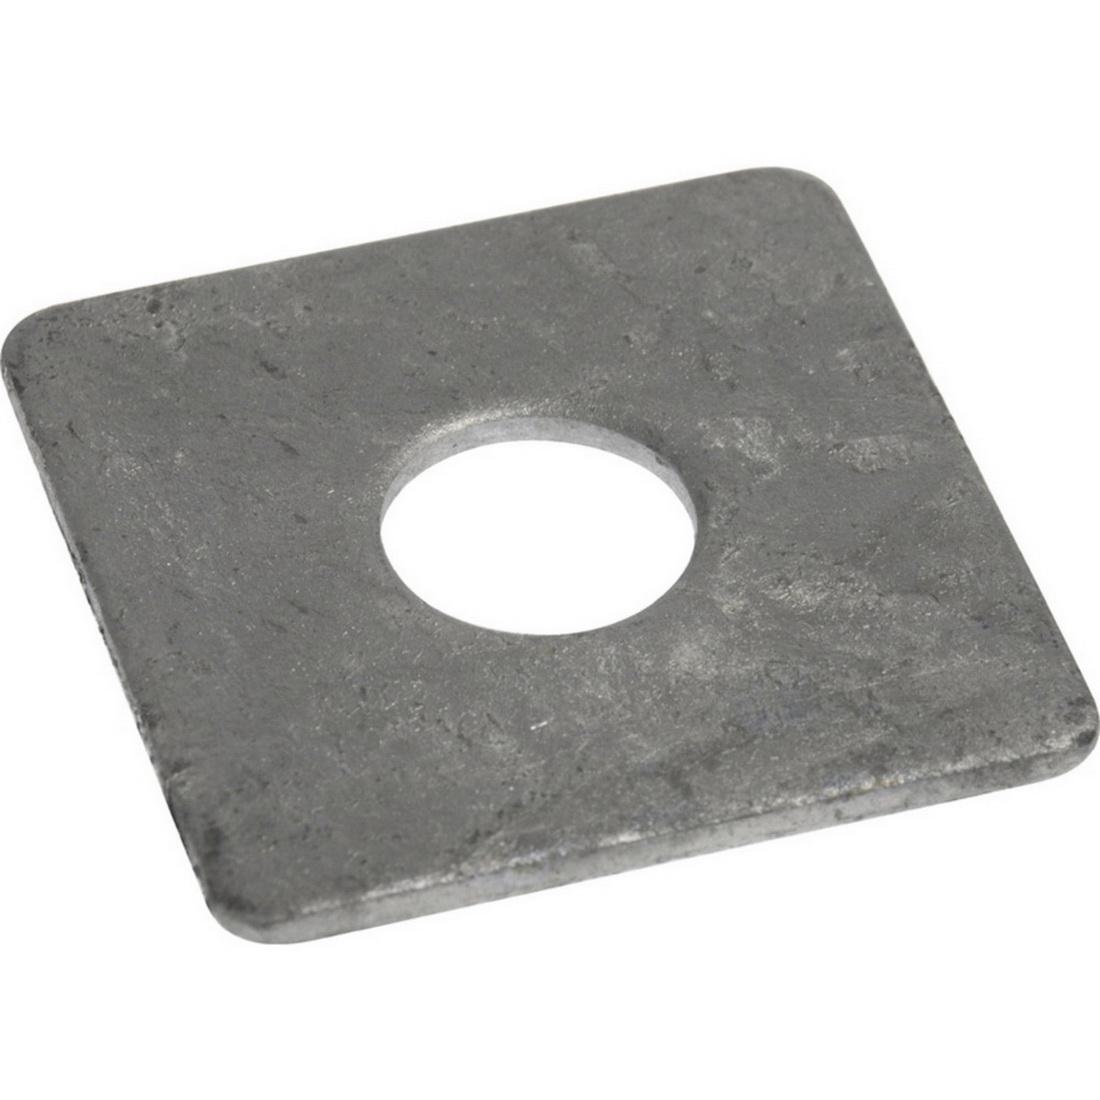 Flat Square Washer M12 x 50 x 6mm Galvanised WSQMG125066